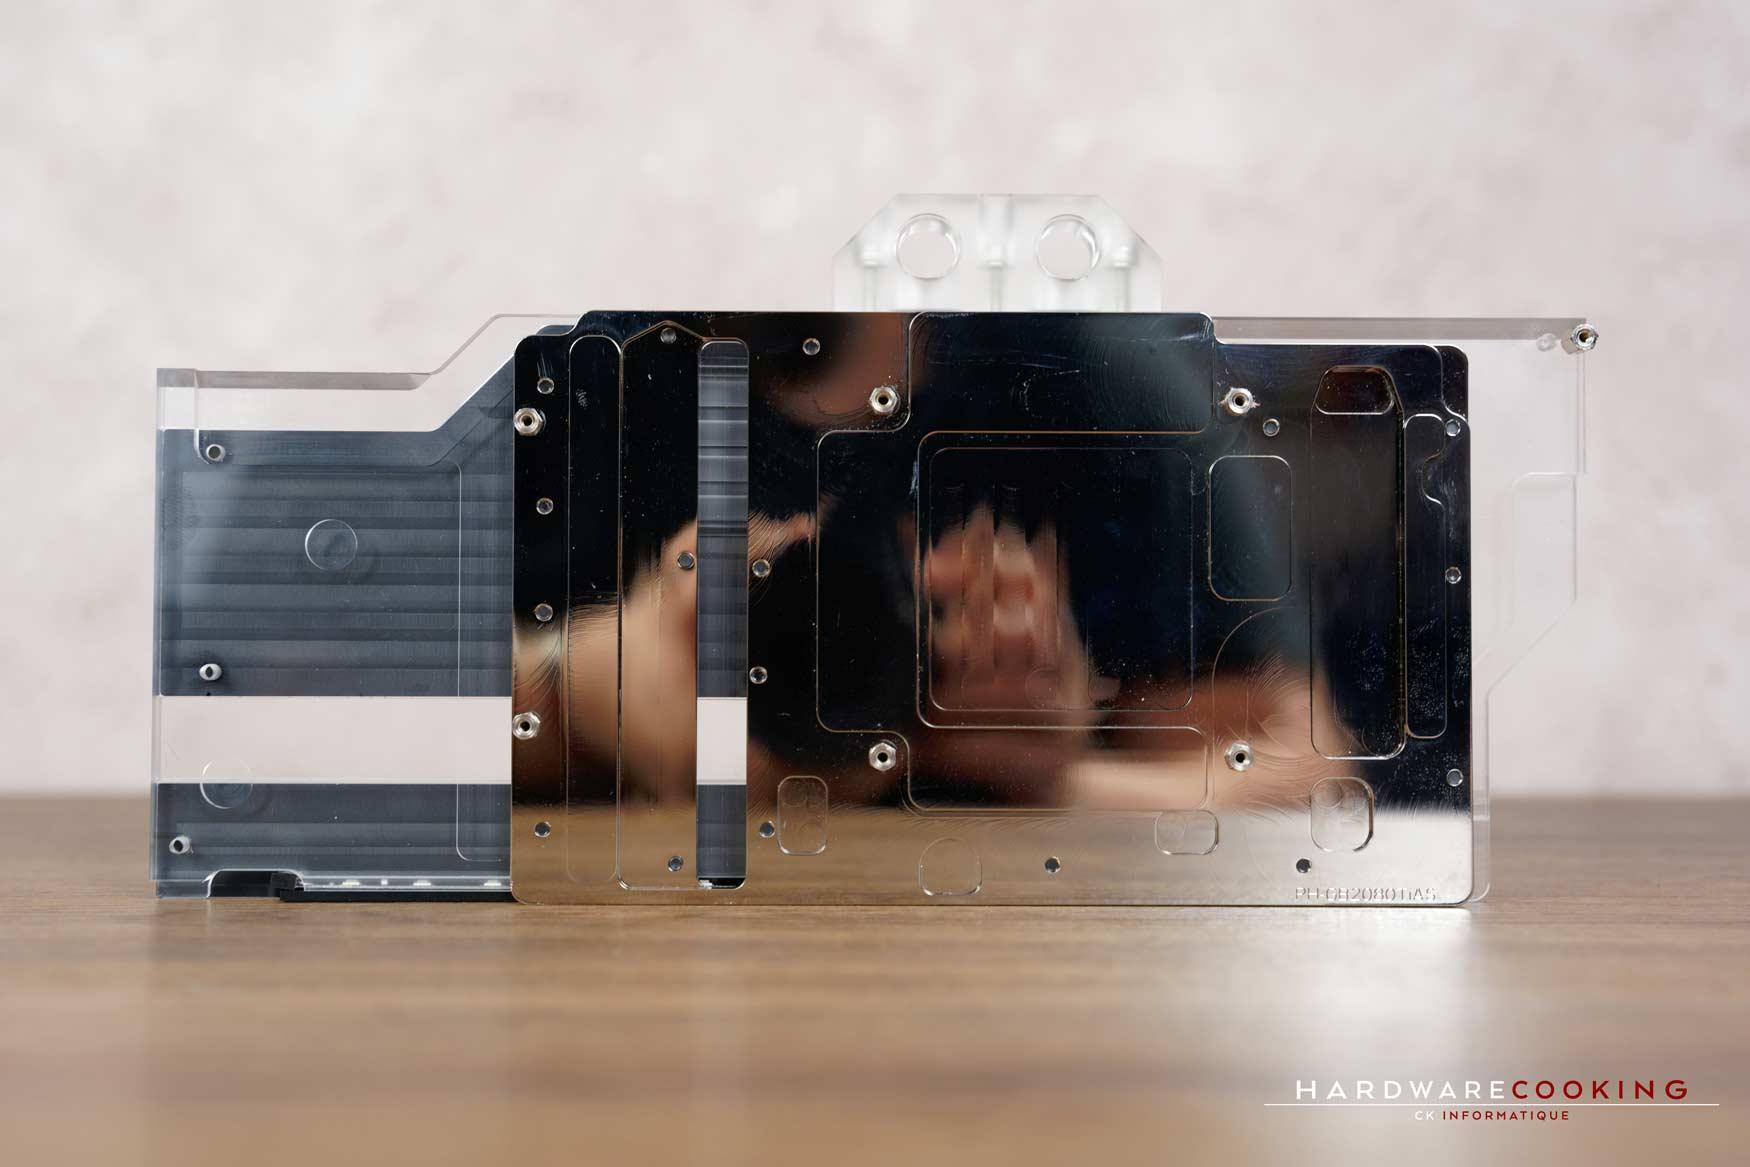 Test waterblock GPU Phanteks Glacier G2080Ti STRIX Edition